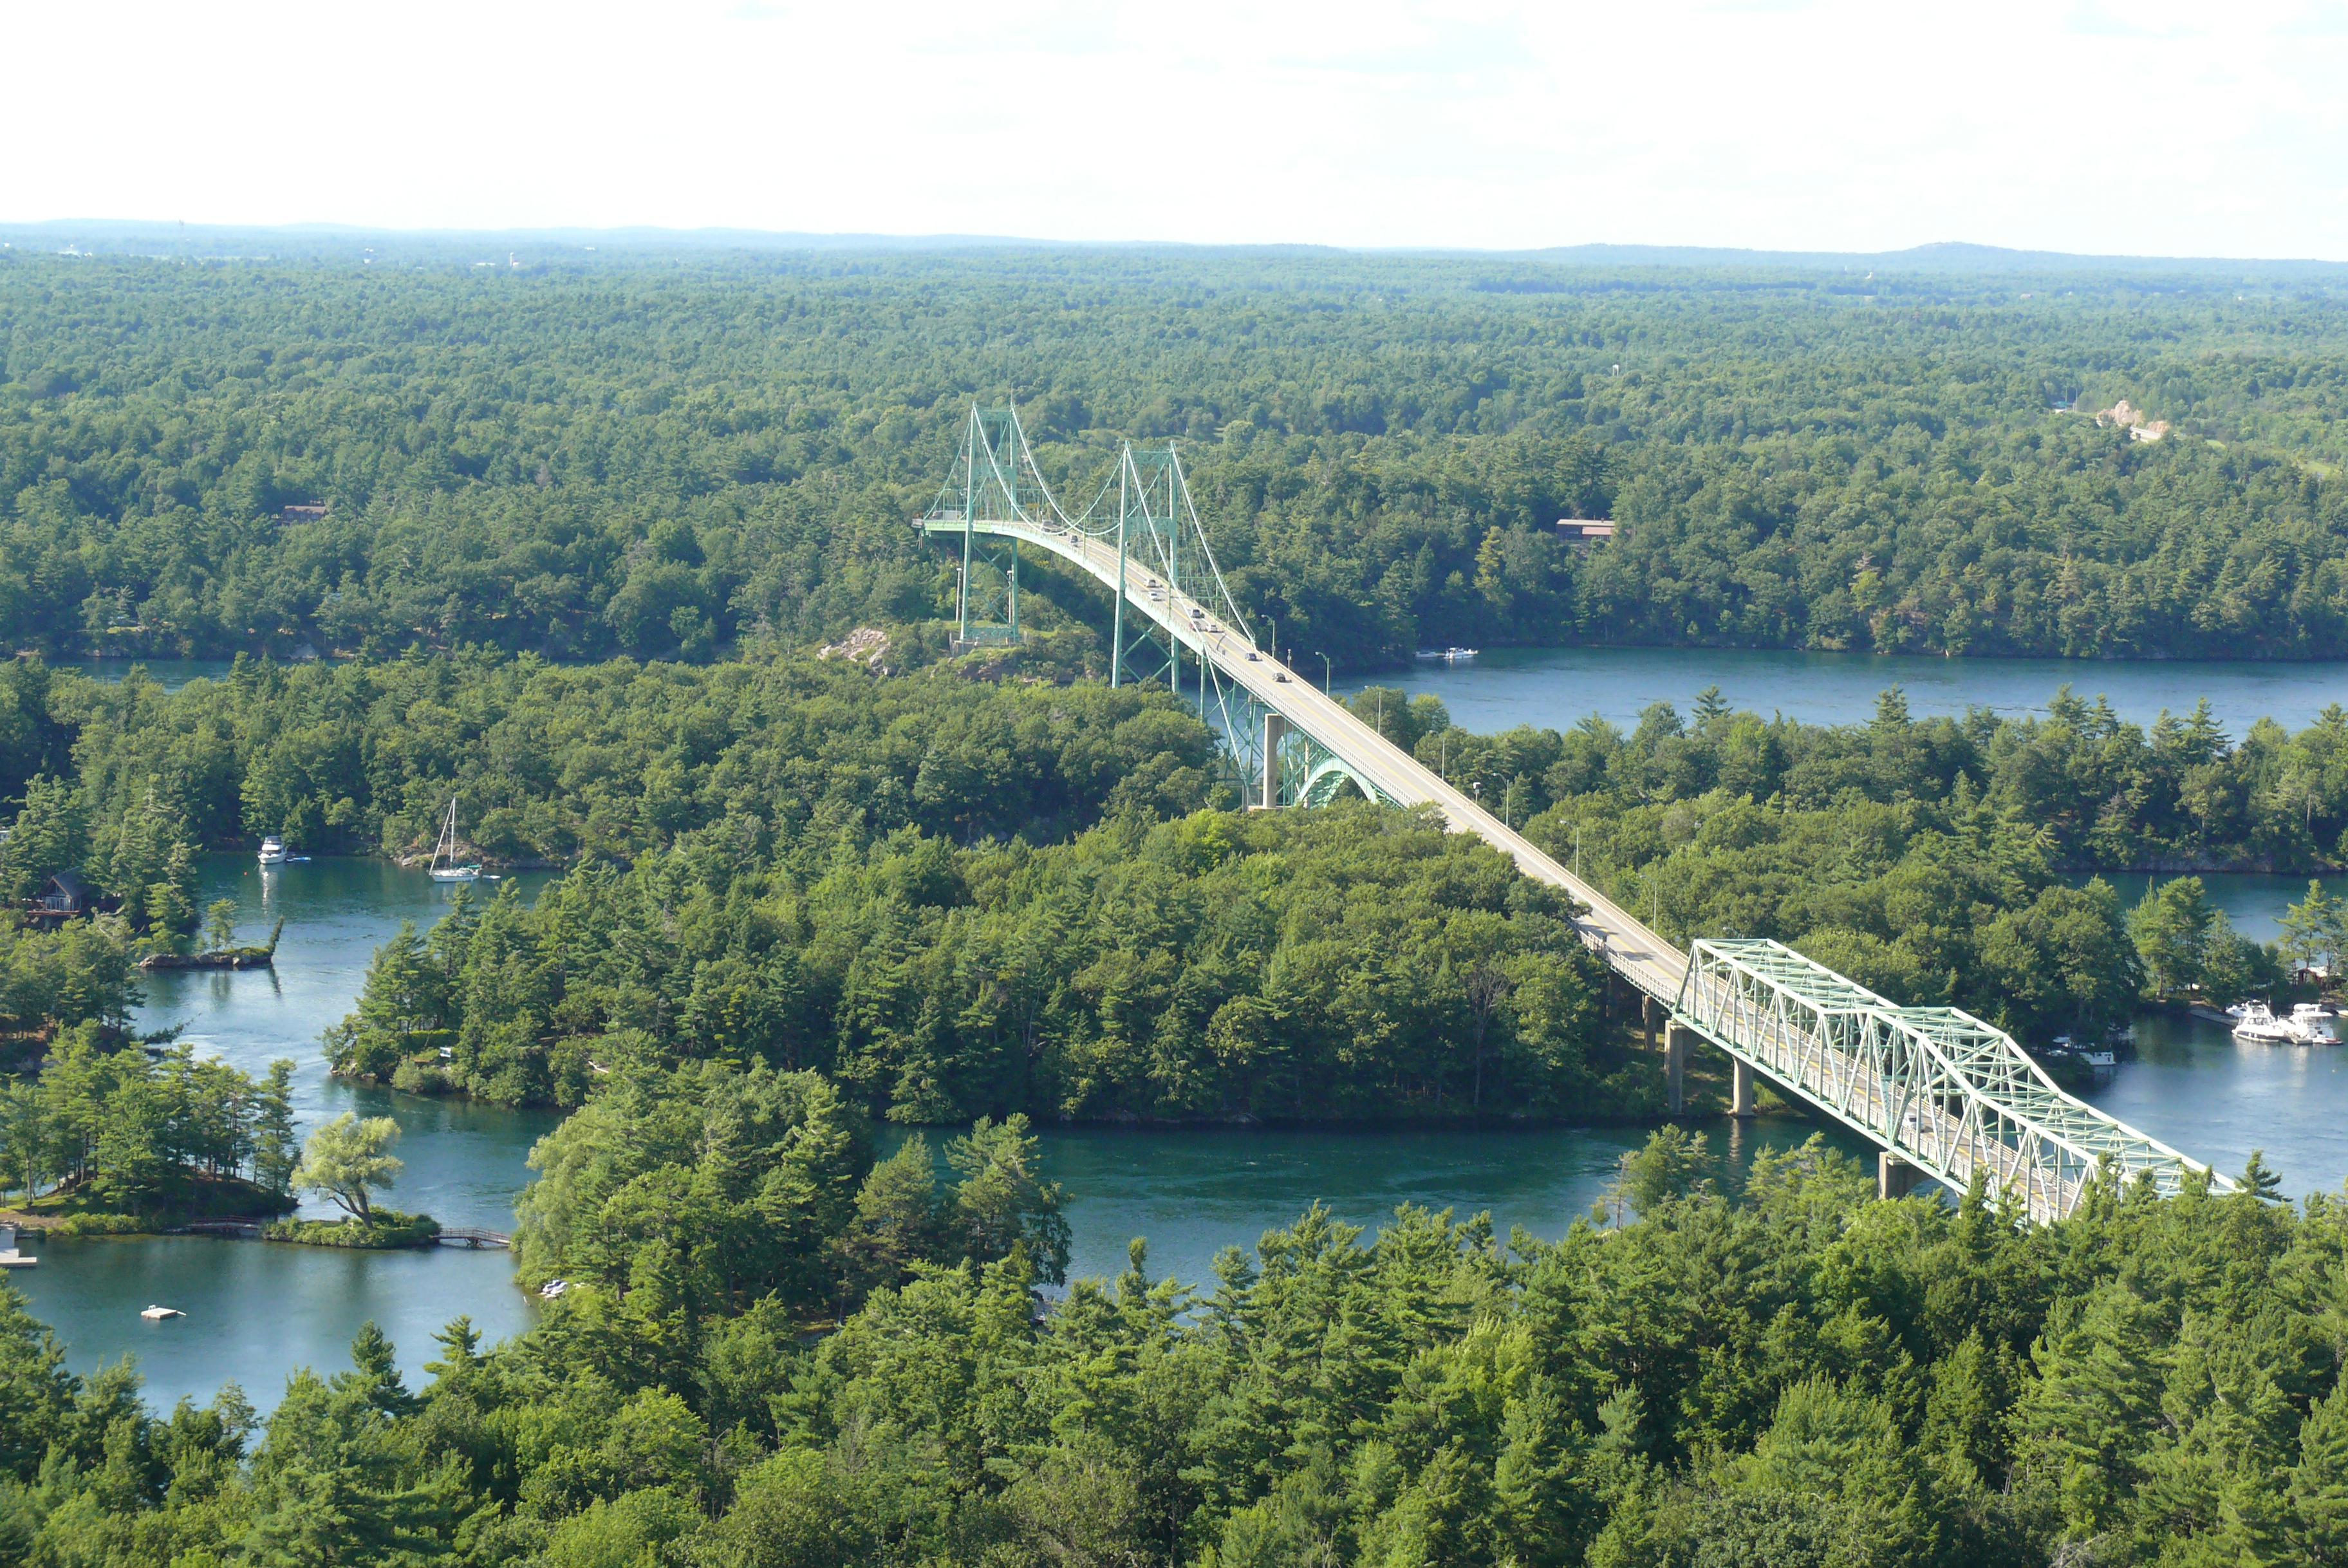 File:Thousand Islands Bridge 5.jpg - Wikipedia, the free encyclopedia